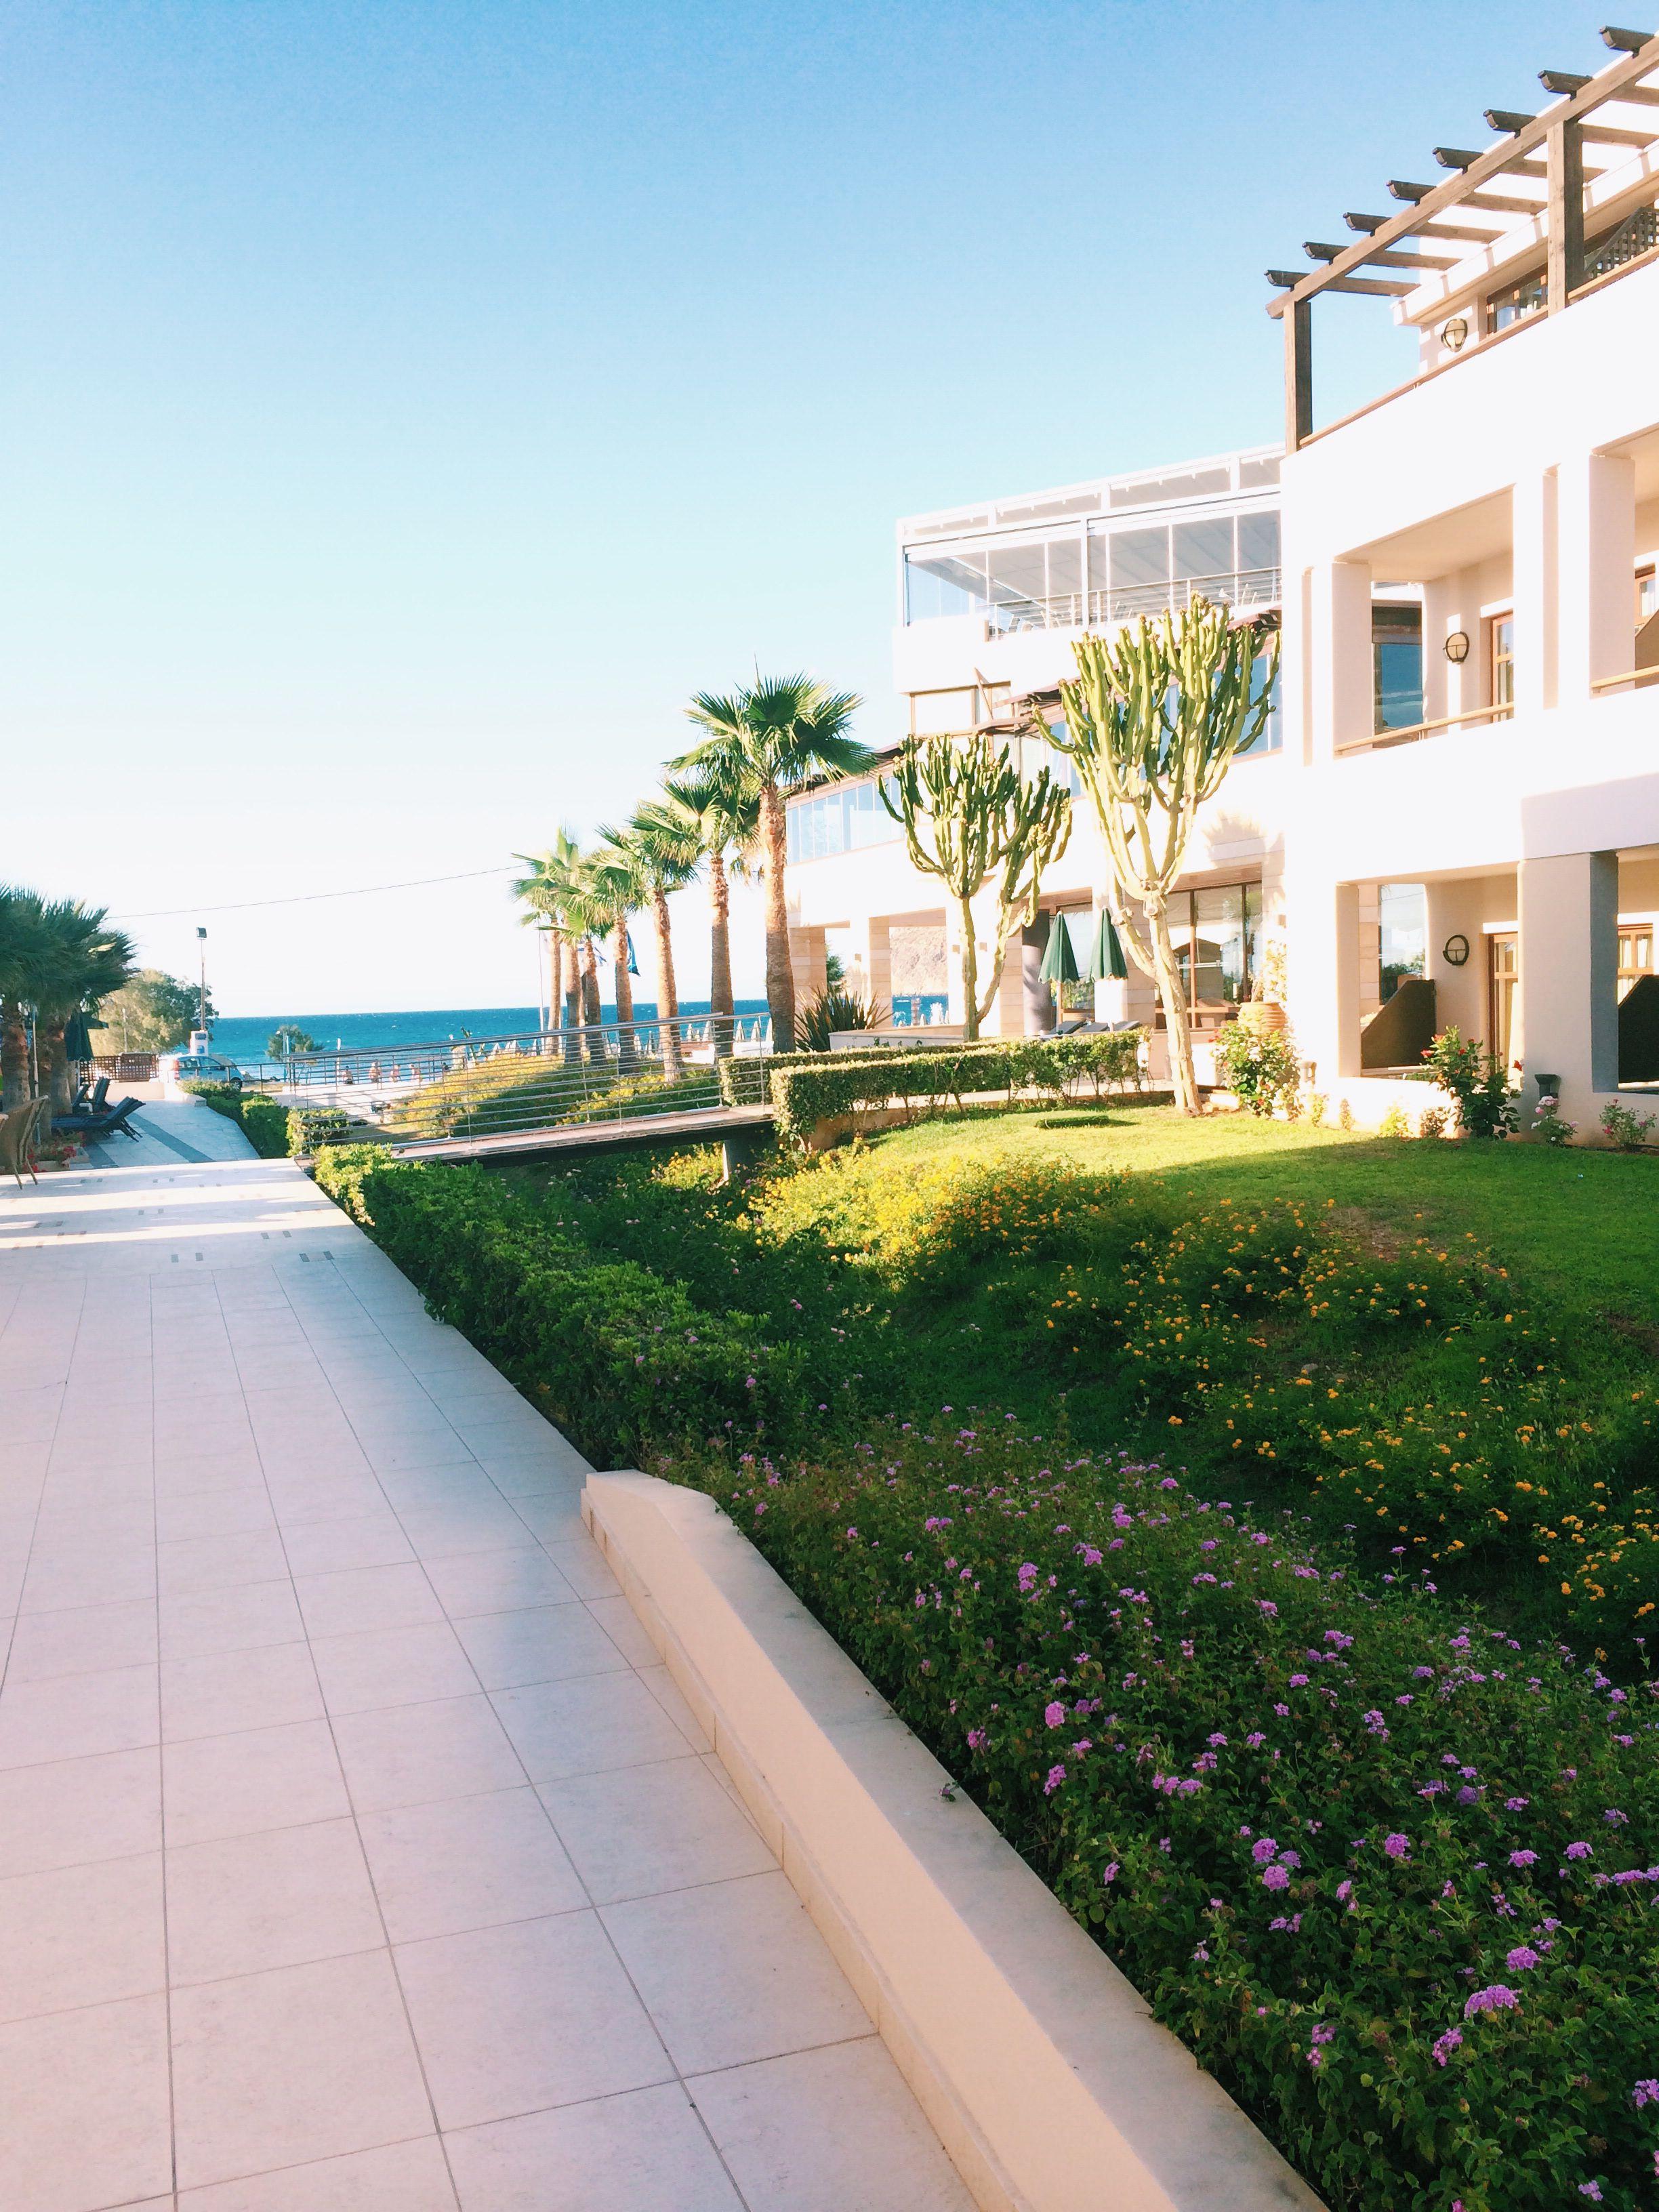 Porto platanias crete